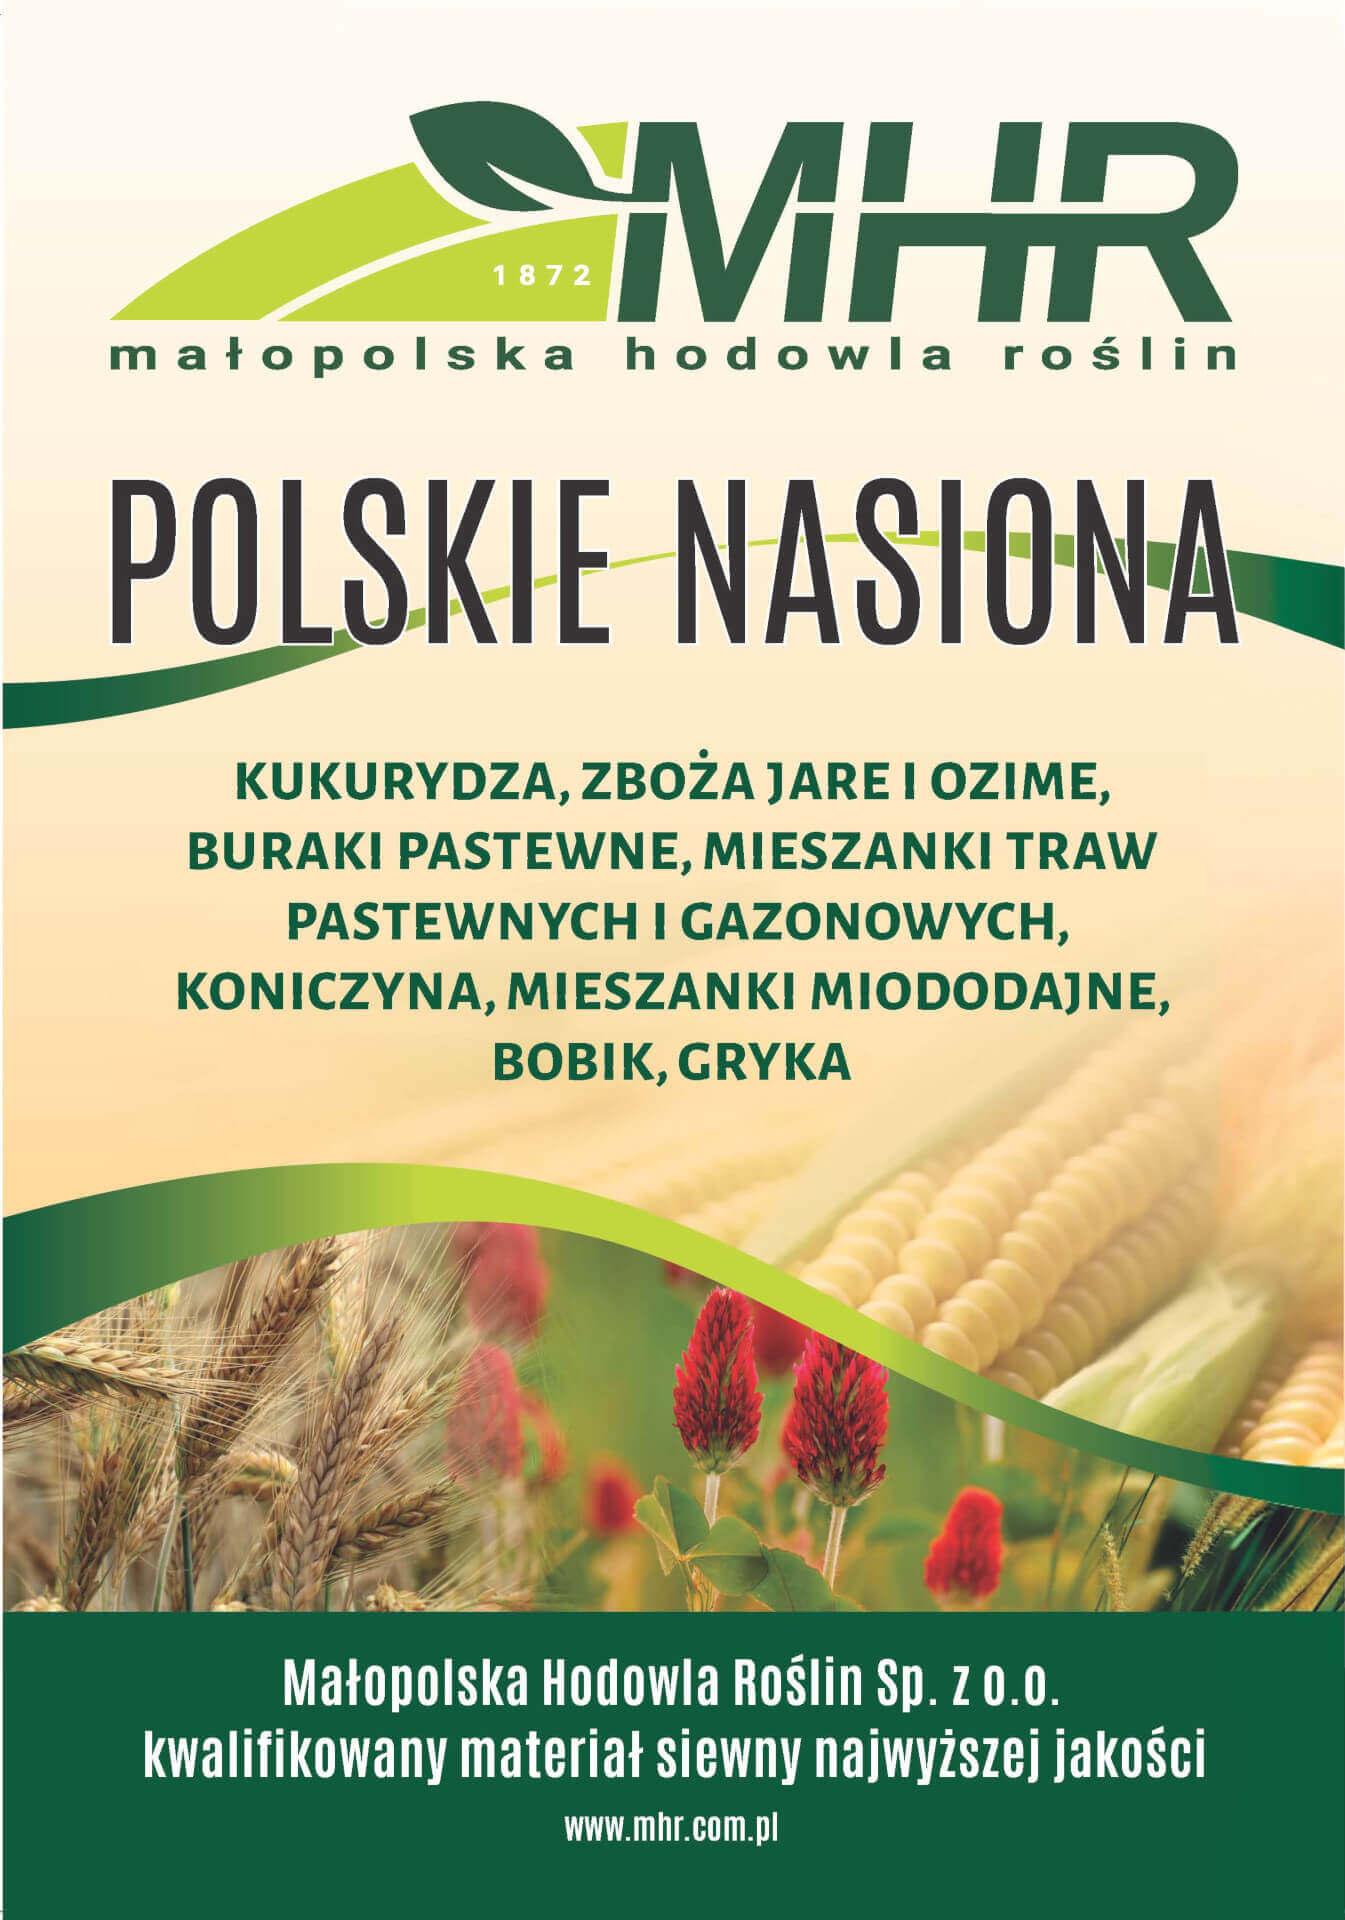 Polskie nasiona